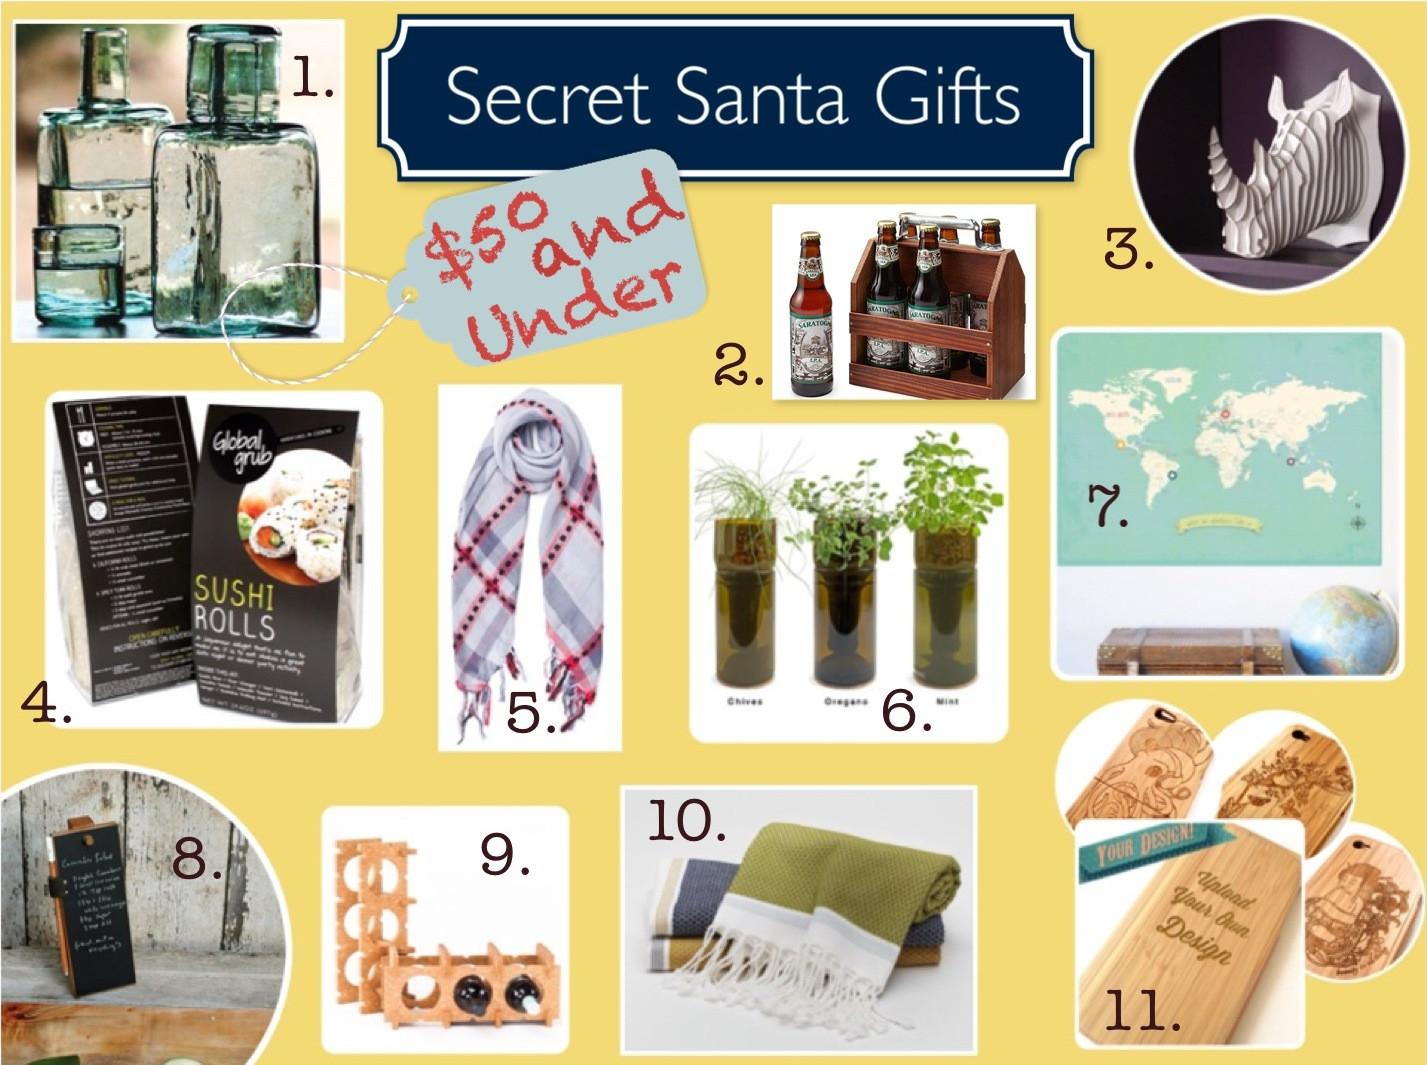 Unisex Holiday Gift Ideas  Ethical Secret Santa Gifts Under $50 Made To Travel